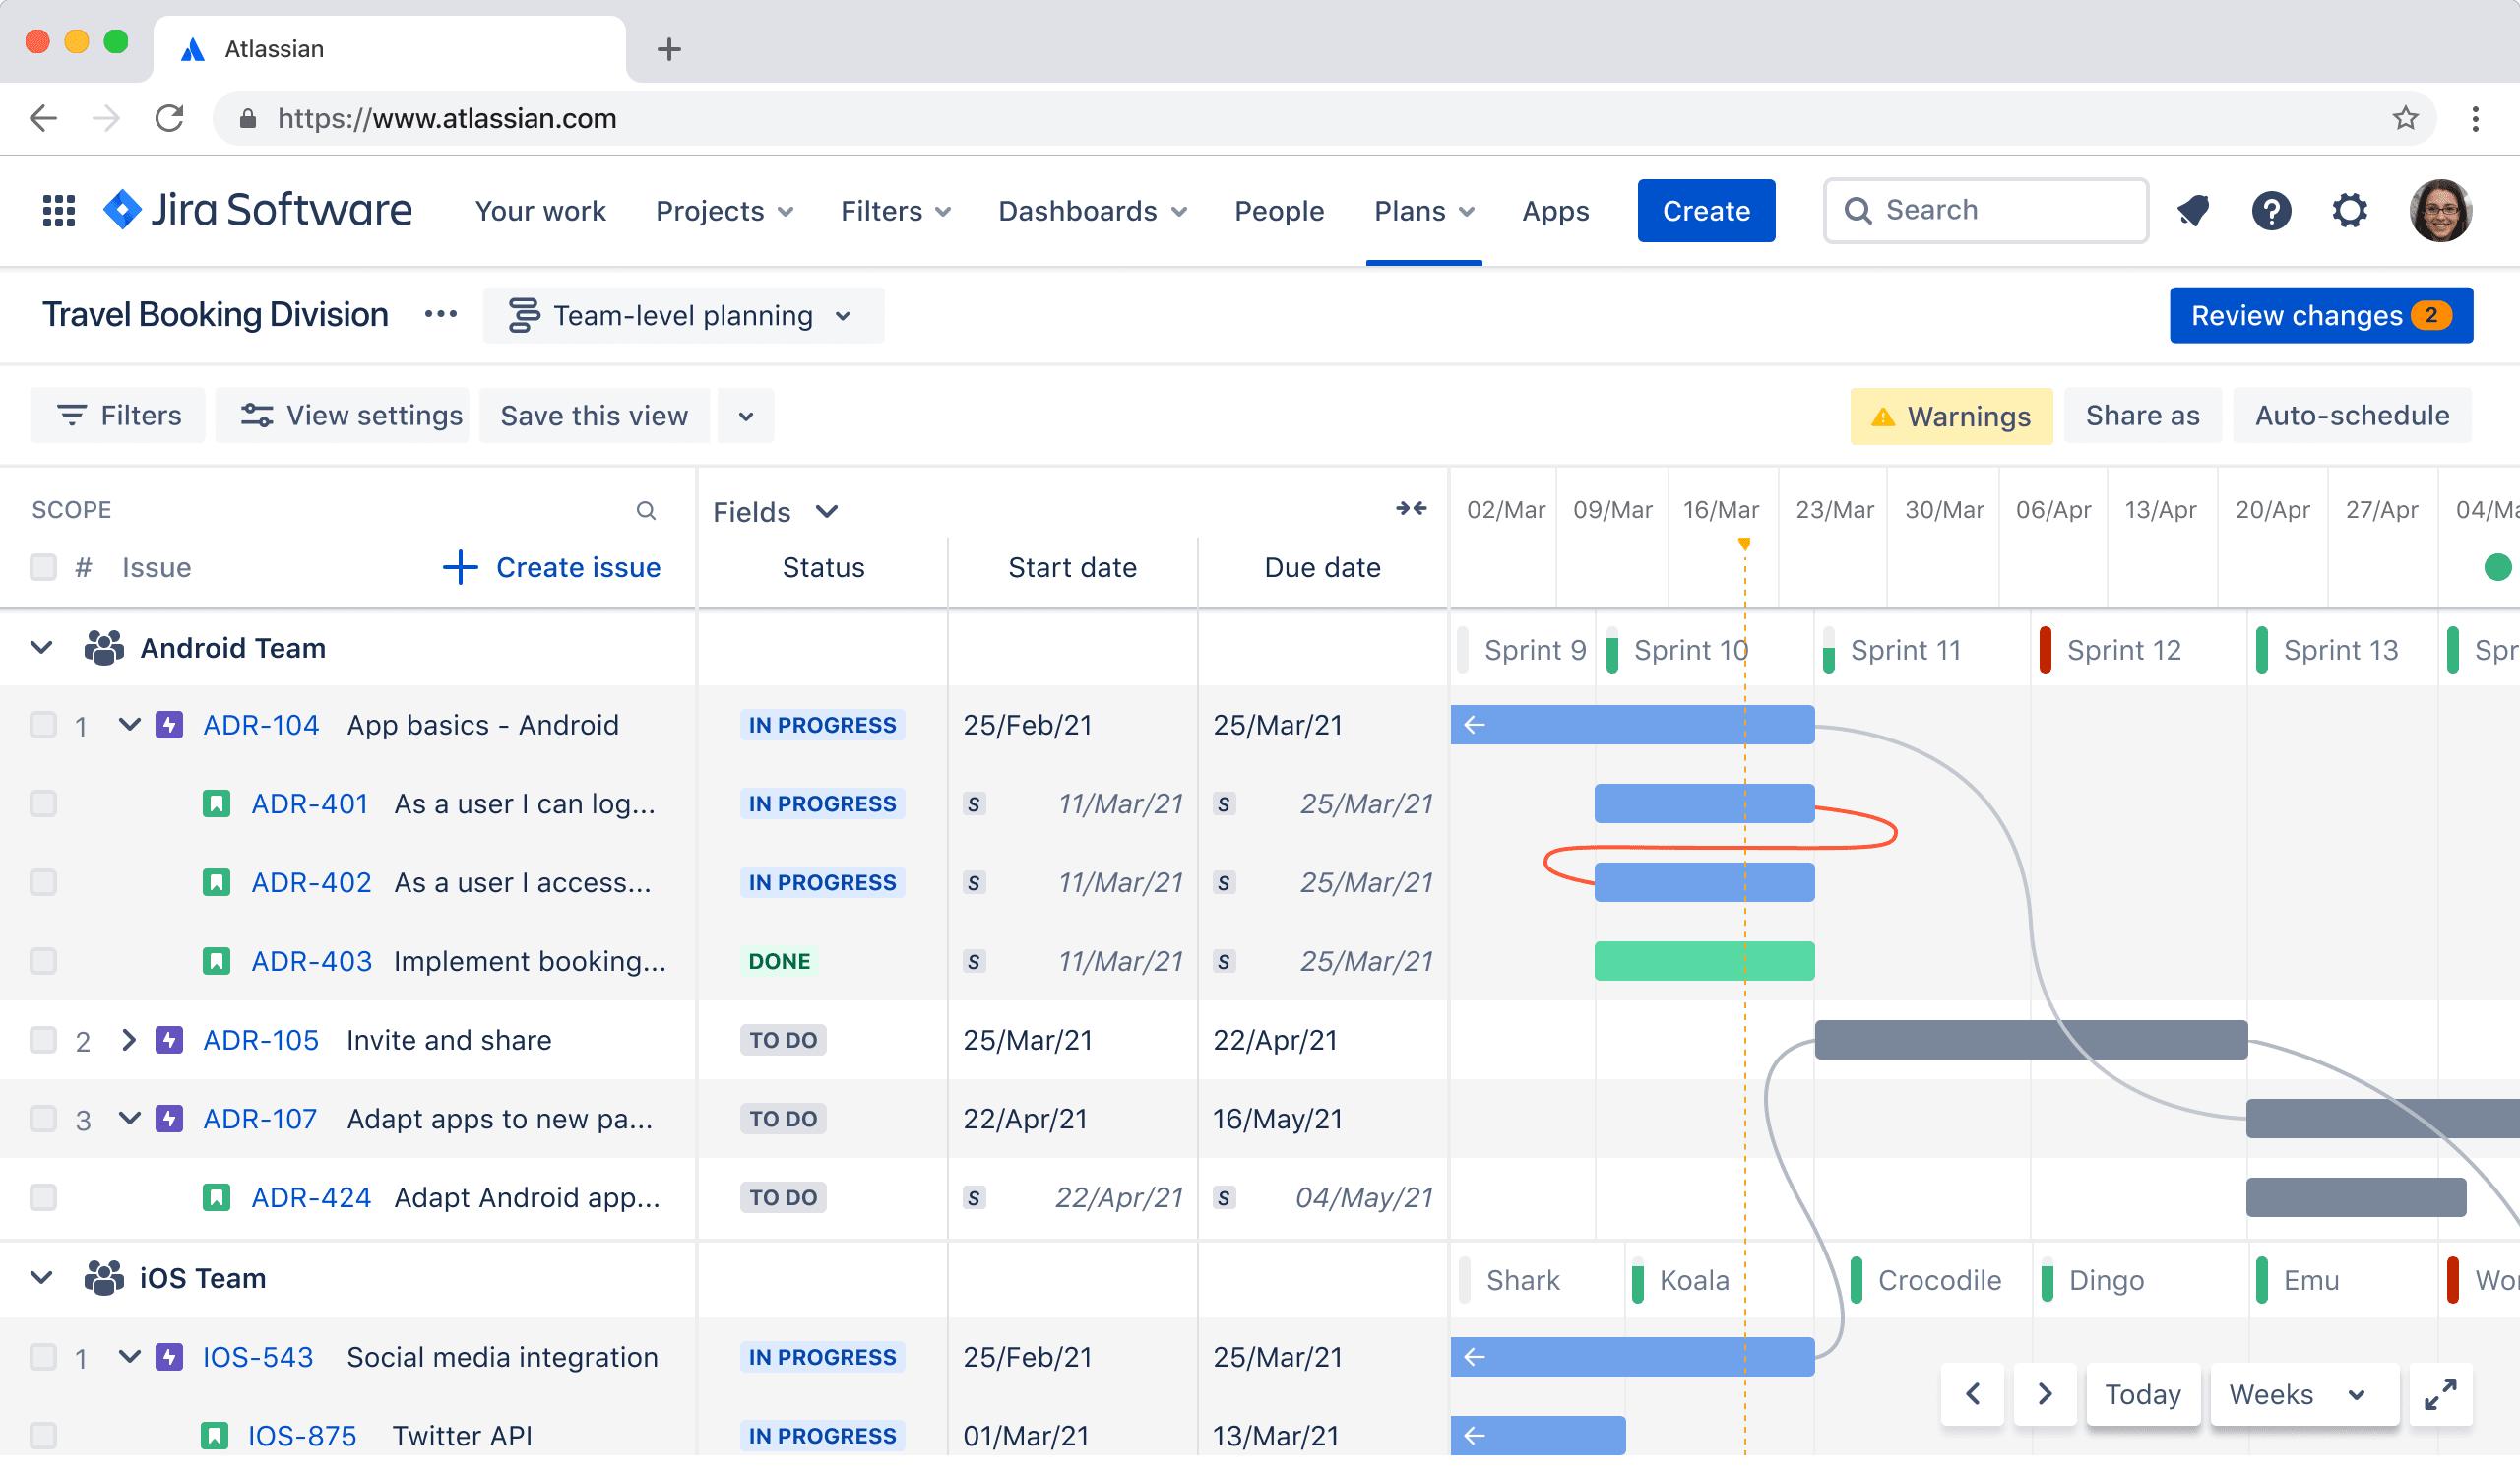 Zrzut ekranu harmonogramu produktu